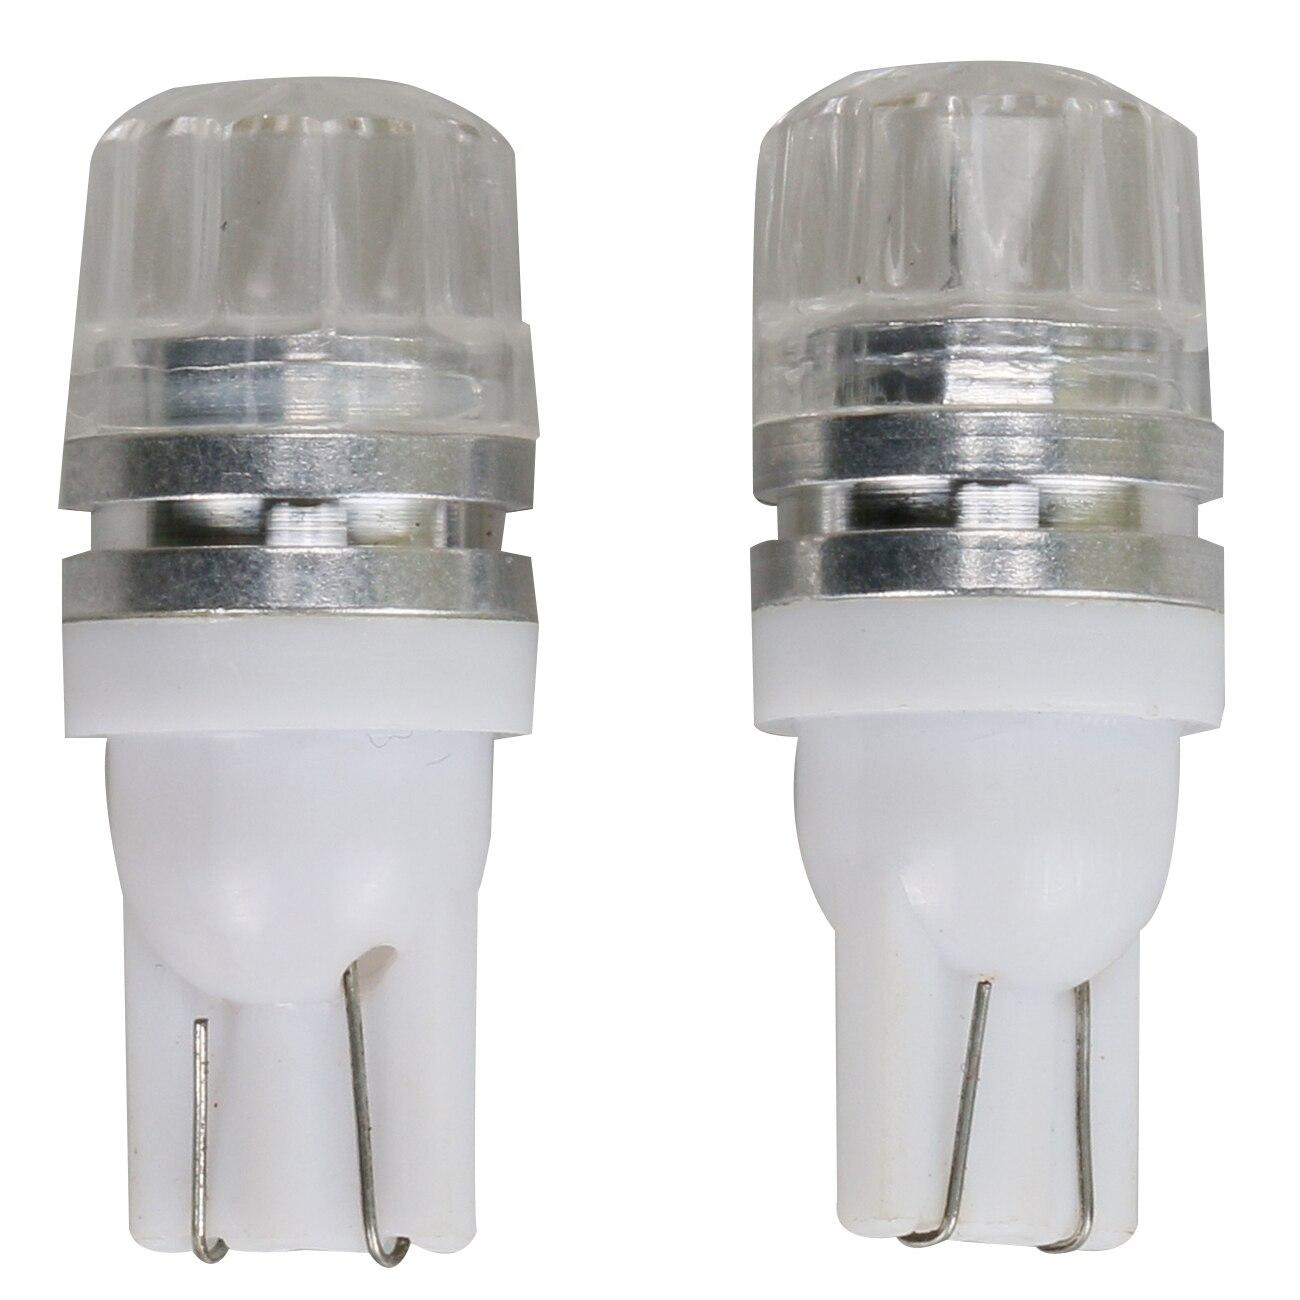 Auto Single Contact Bayonet Lamp Brake Turn Signal Light 5730 T10 SMD LED DC 12V (Pack of 2)